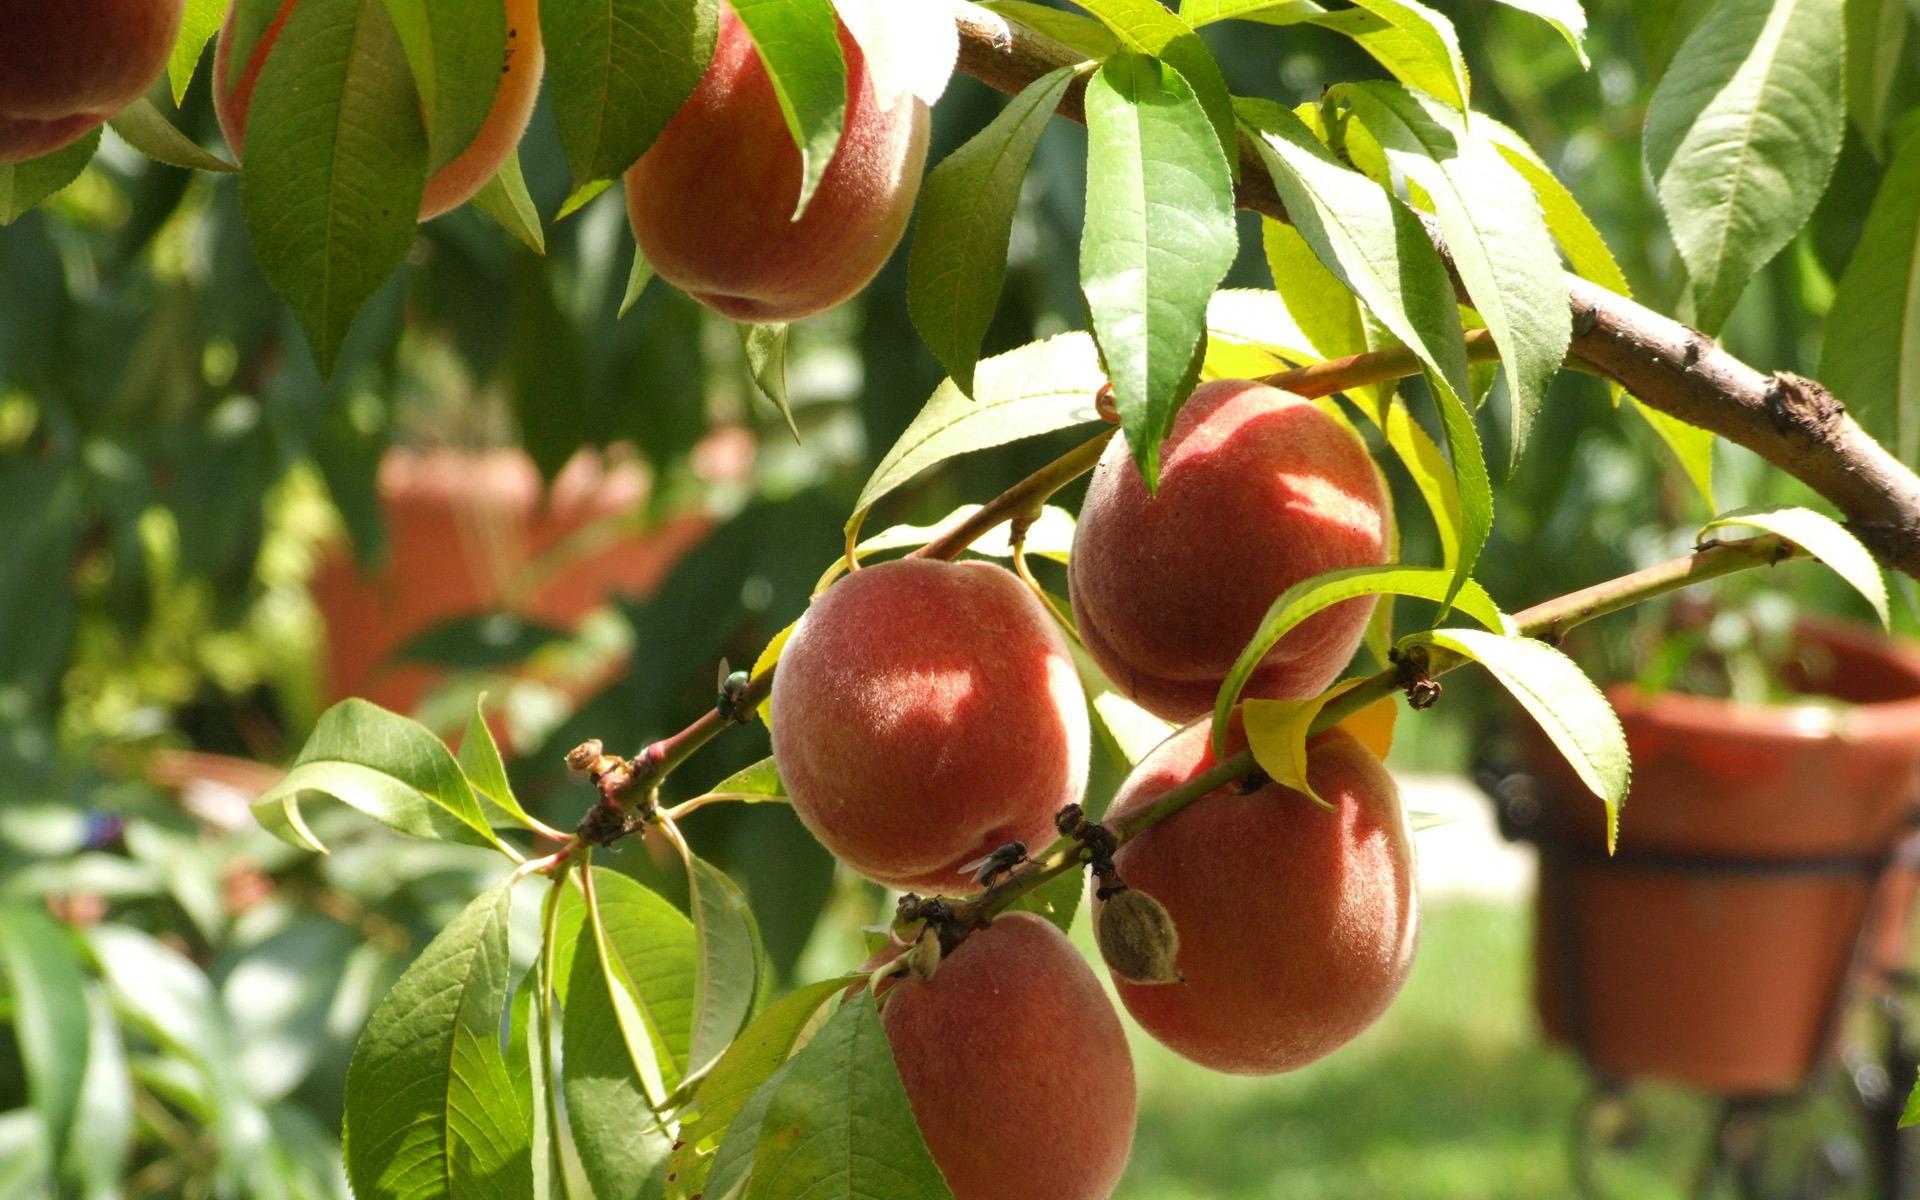 Wallpaper fruits free download - Peaches Wallpaper Fruits Nature